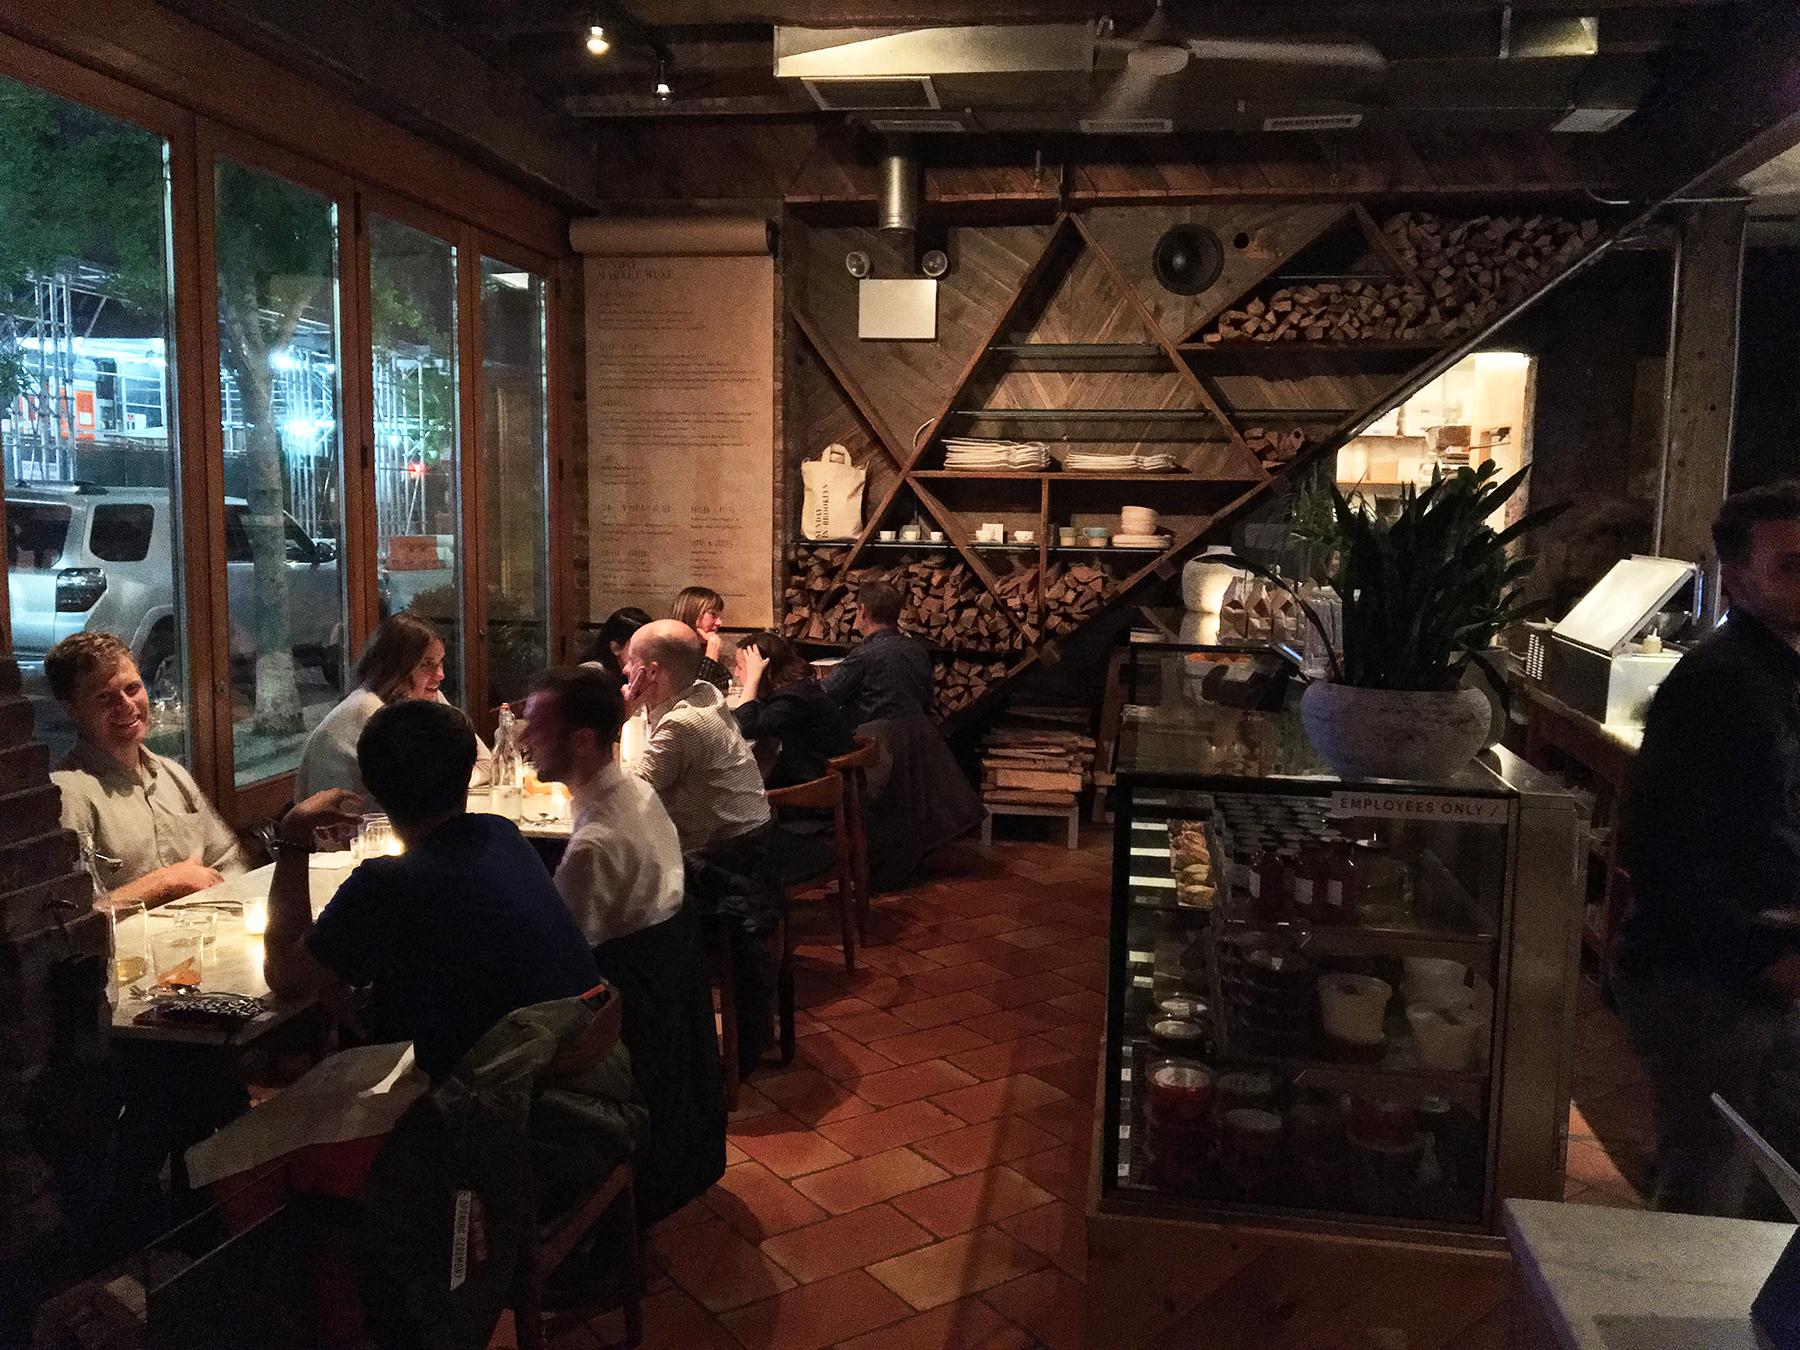 Sunday_in_Brooklyn_Dining_Room.jpg